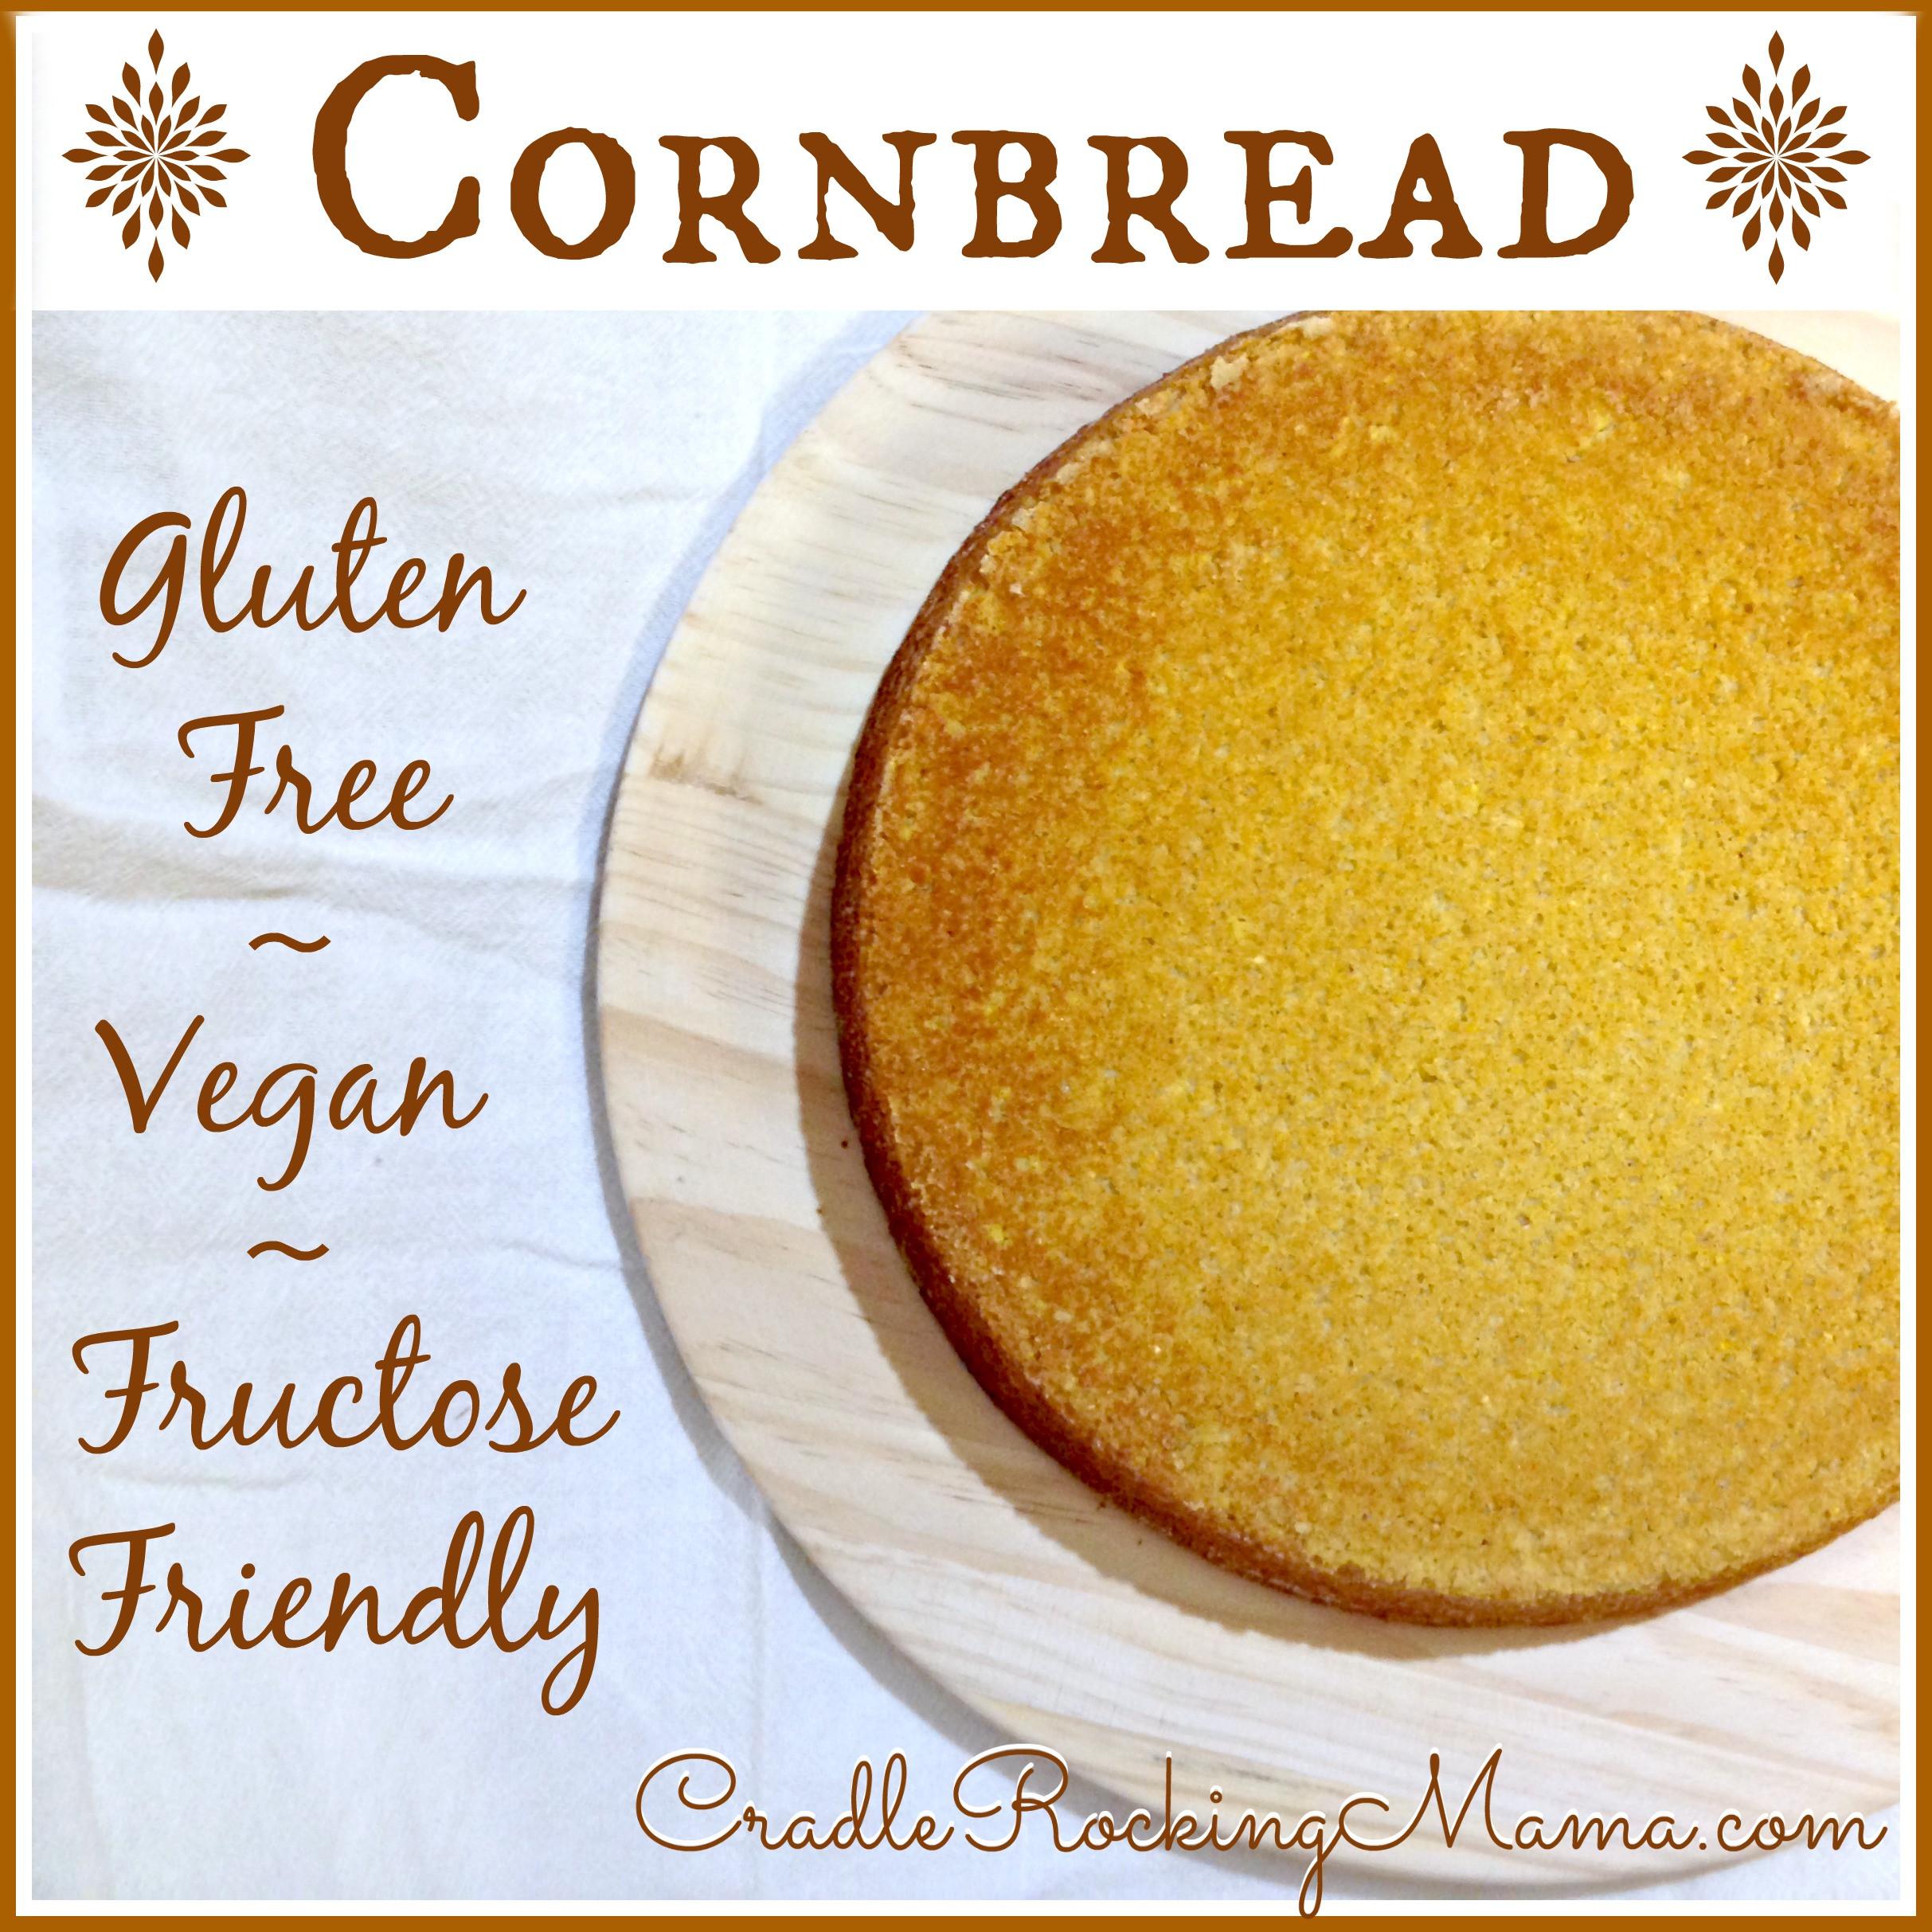 Cornbread Gluten Free  Cornbread Vegan Gluten Free and Fructose Friendly